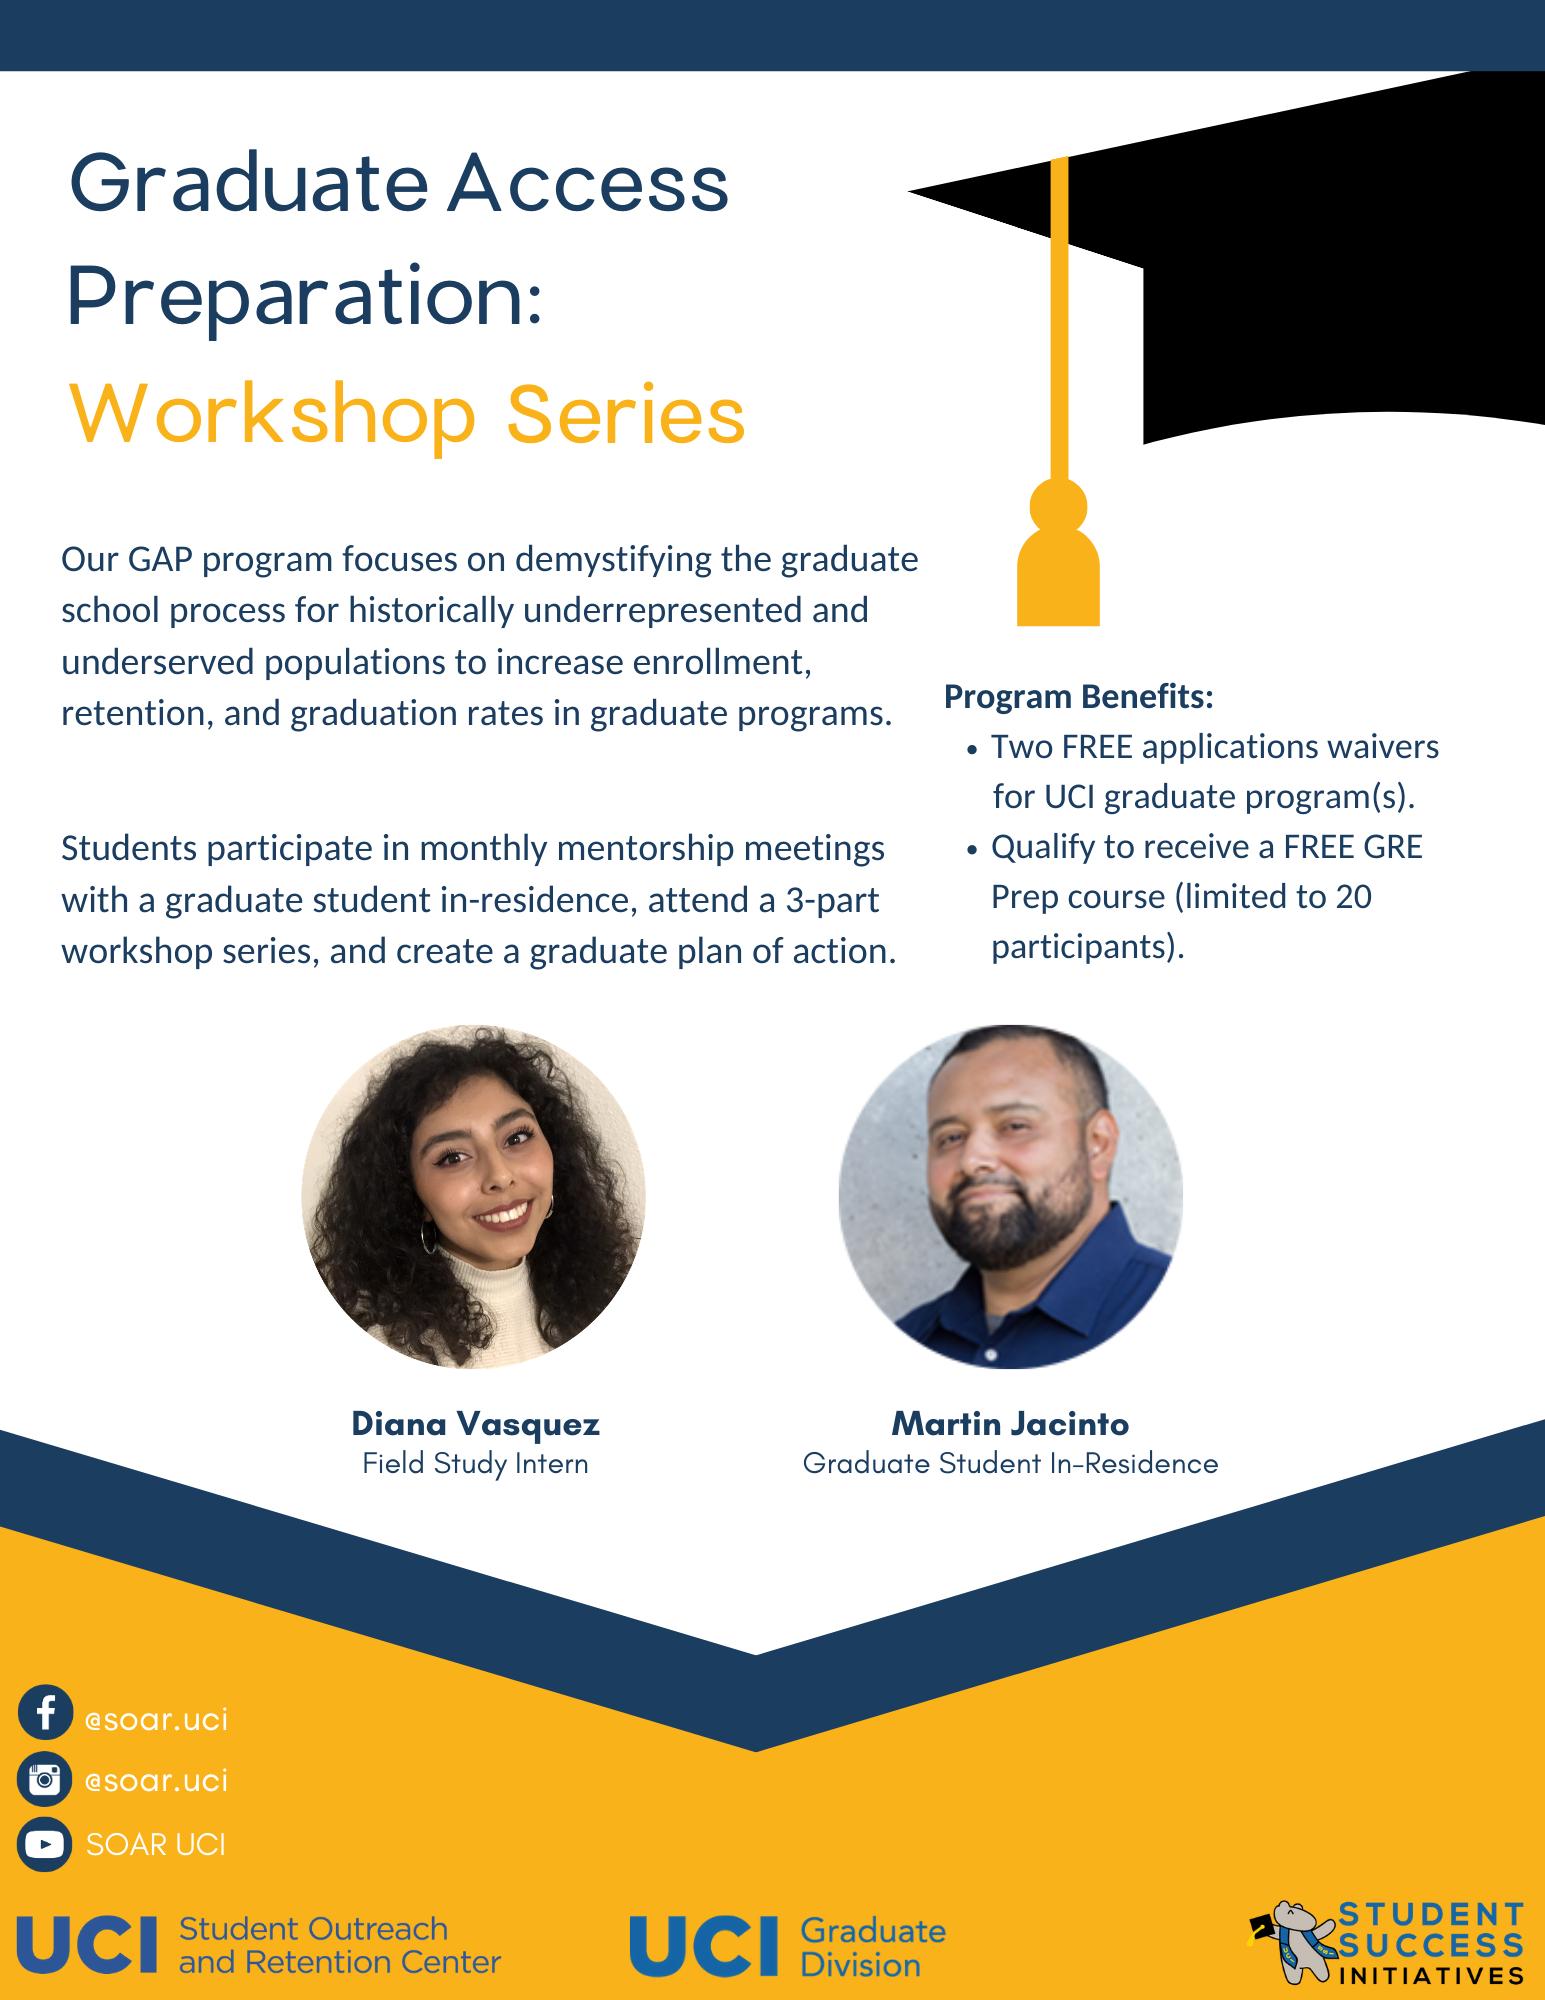 Graduate Access Preparation Program